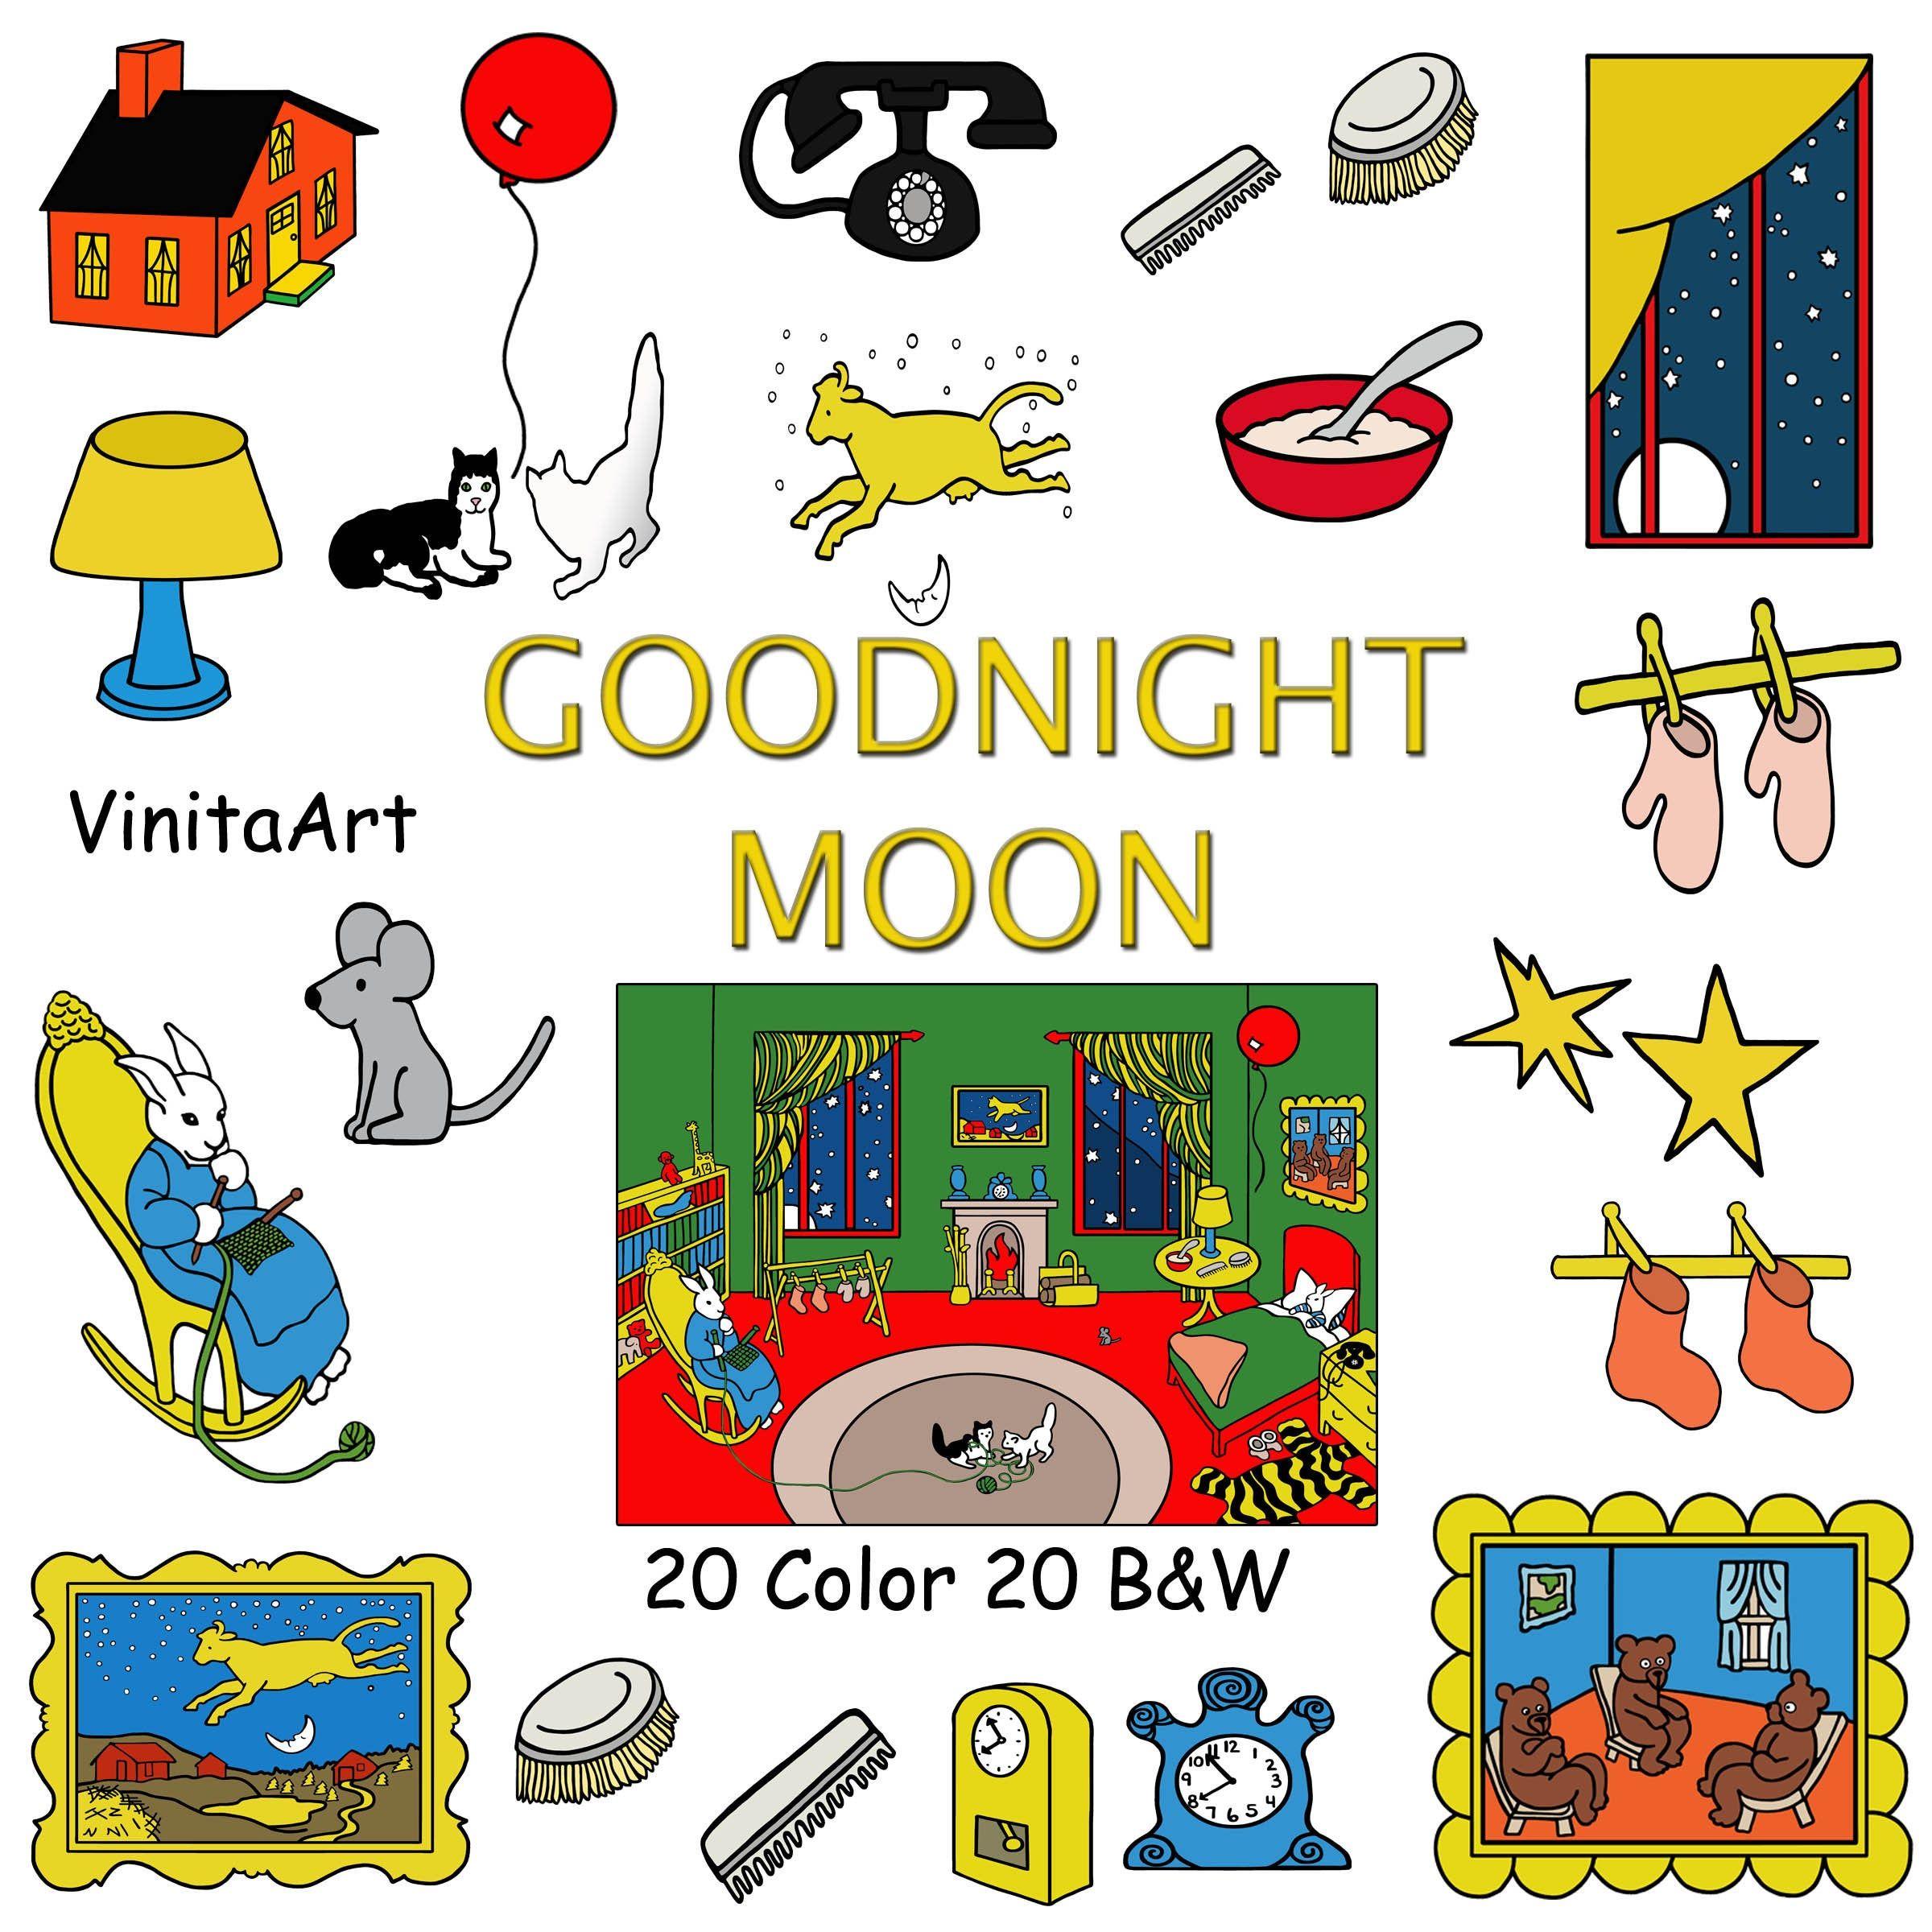 Goodnight Moon Storybook Clip Art Printable Coloring Pages Etsy Good Night Moon Book Clip Art Goodnight Moon Book